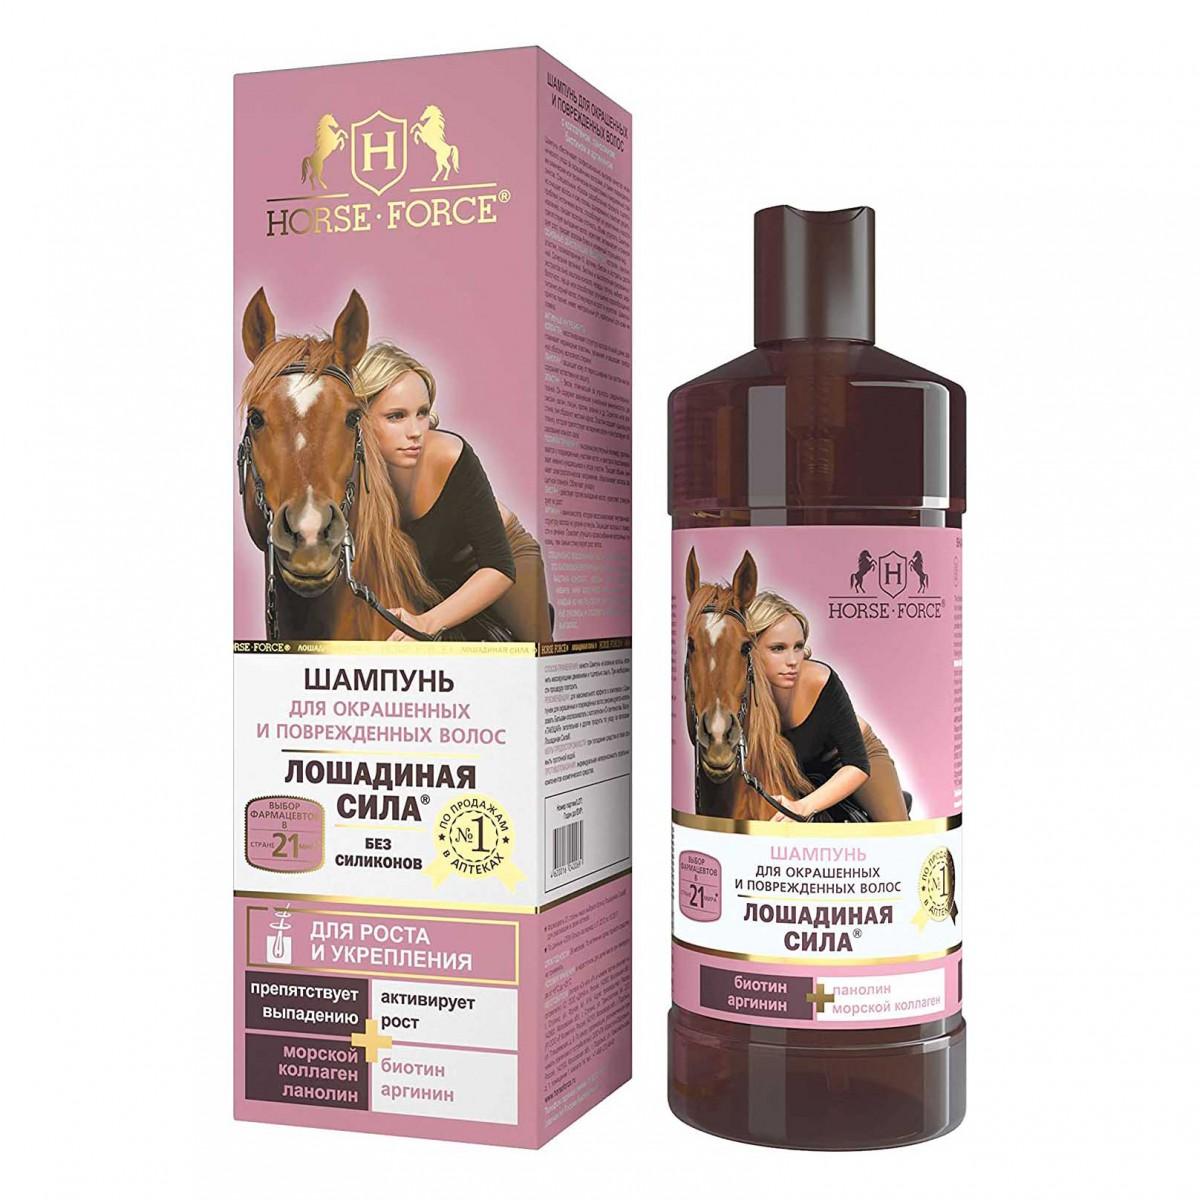 Konjska moč - šampon za poškodovane lase, 500 ml/Лошадиная сила - шампунь для поврежденных волос, 500 мл